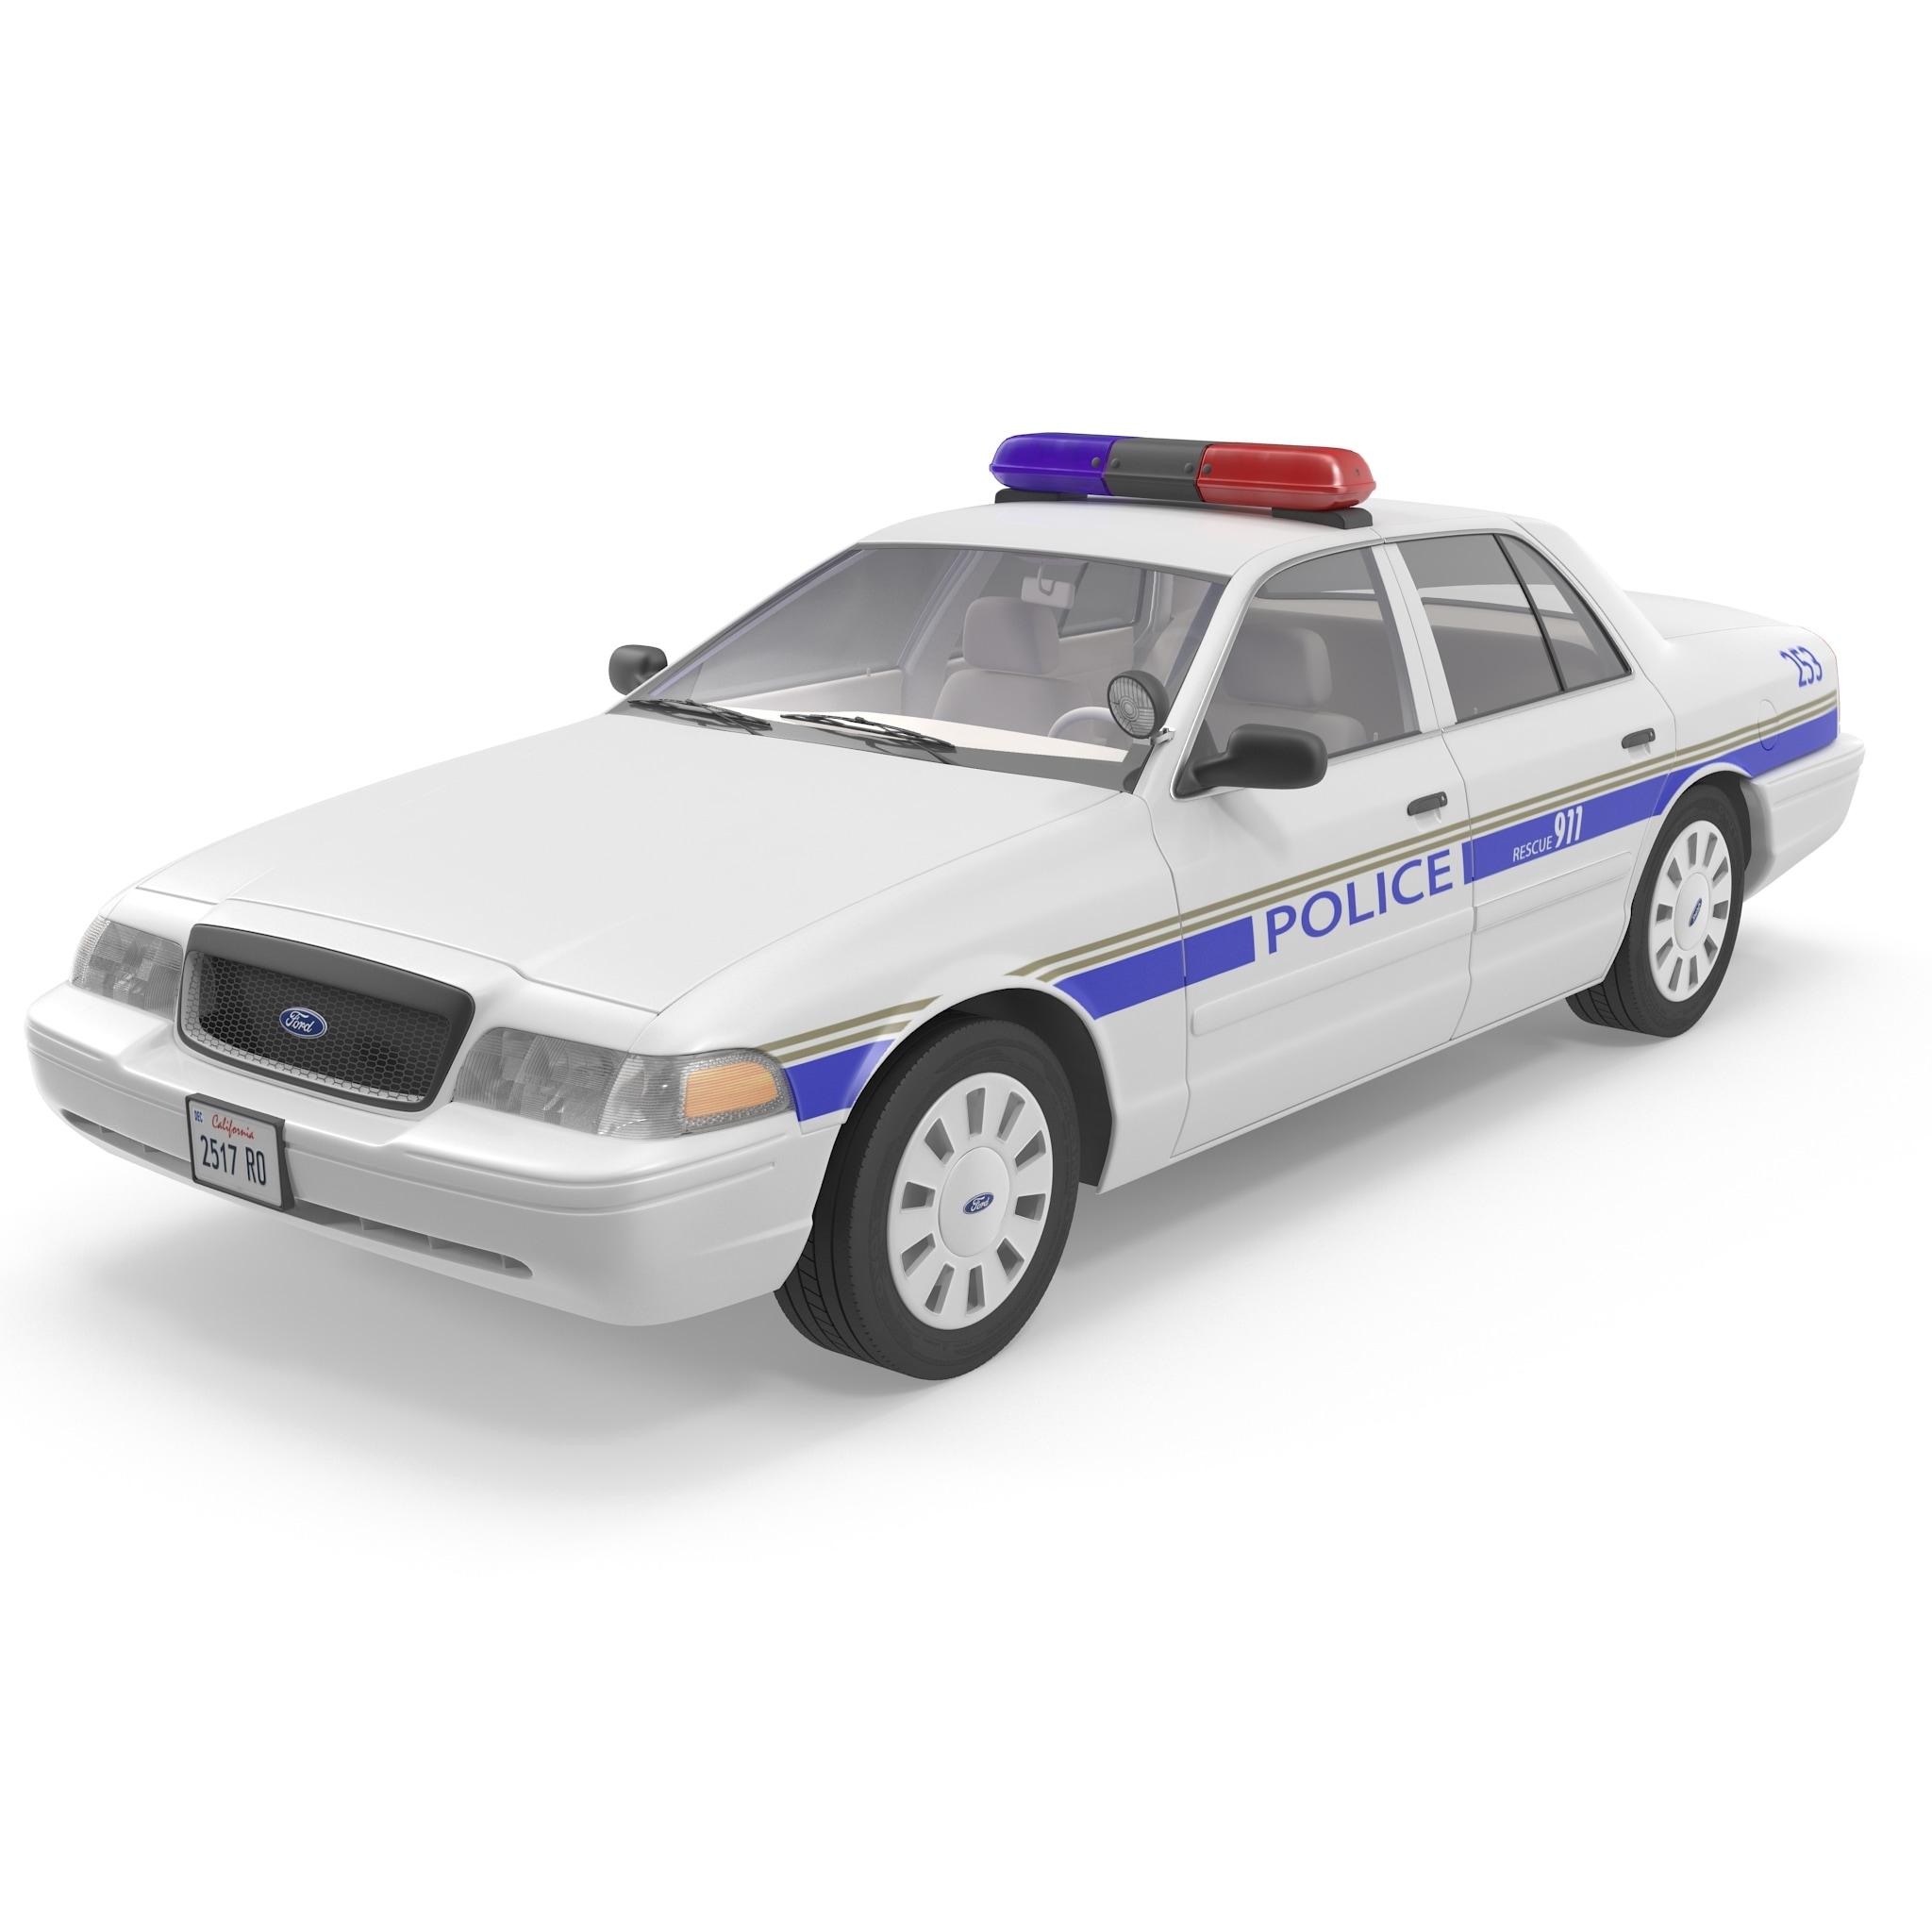 Crown_Victoria_Police_Car_Beauty_0002.jpg